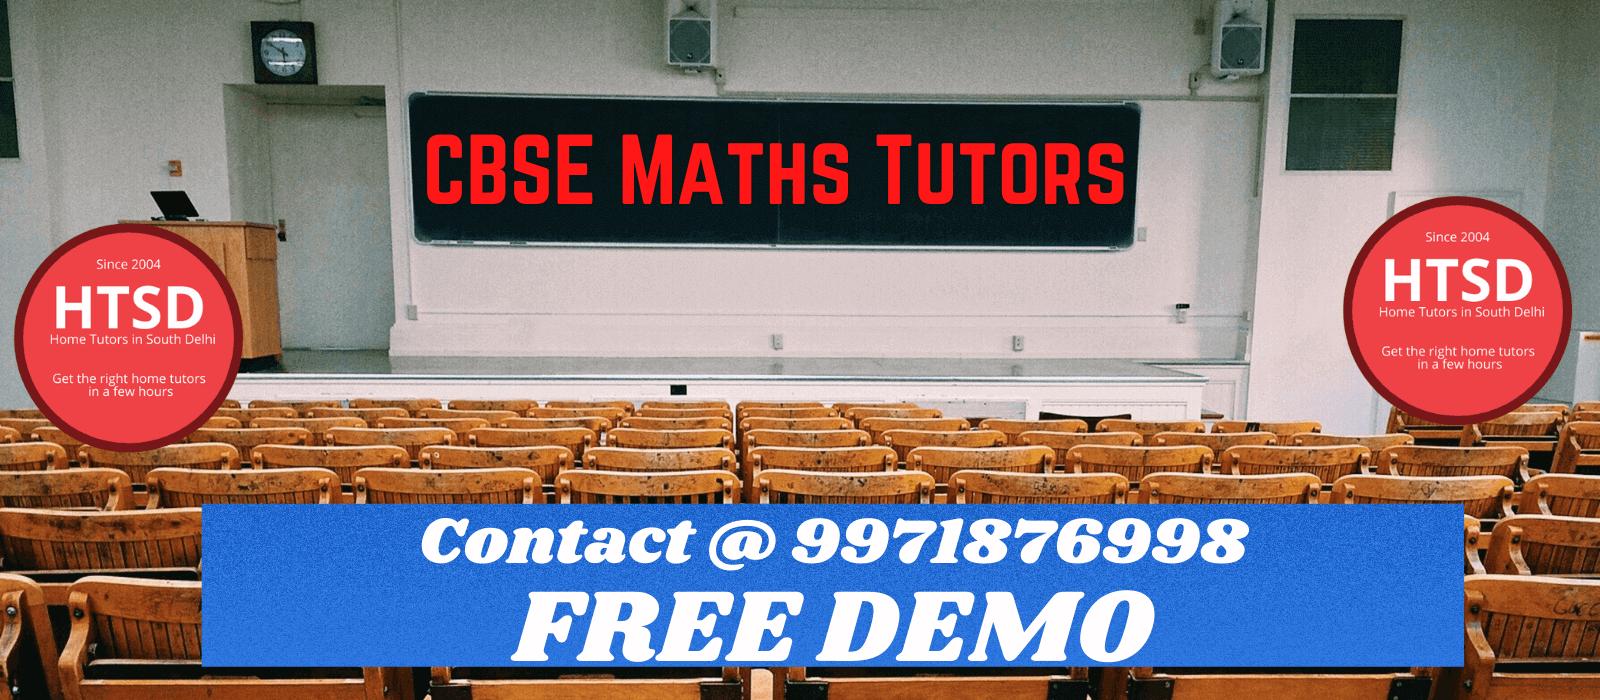 CBSE Maths Tutors in Delhi